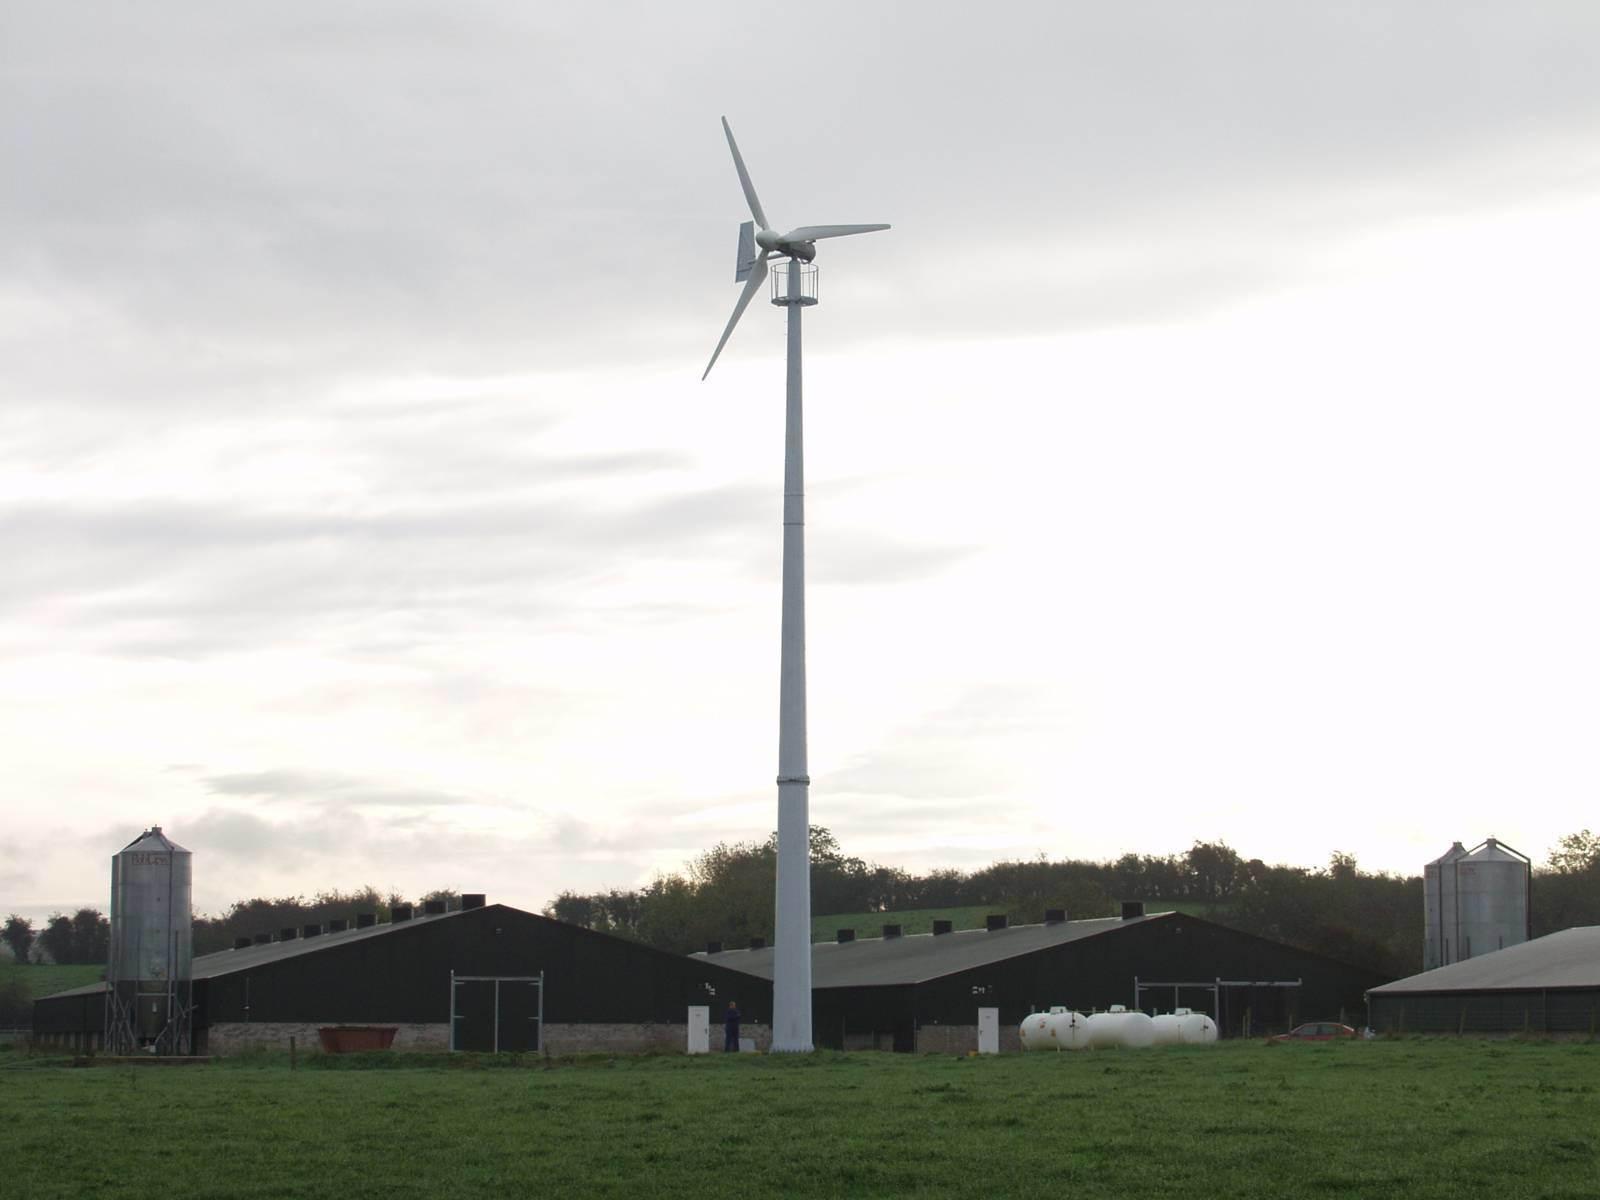 Pin Kw Vertical Axis Wind Turbine Urban Green Energy